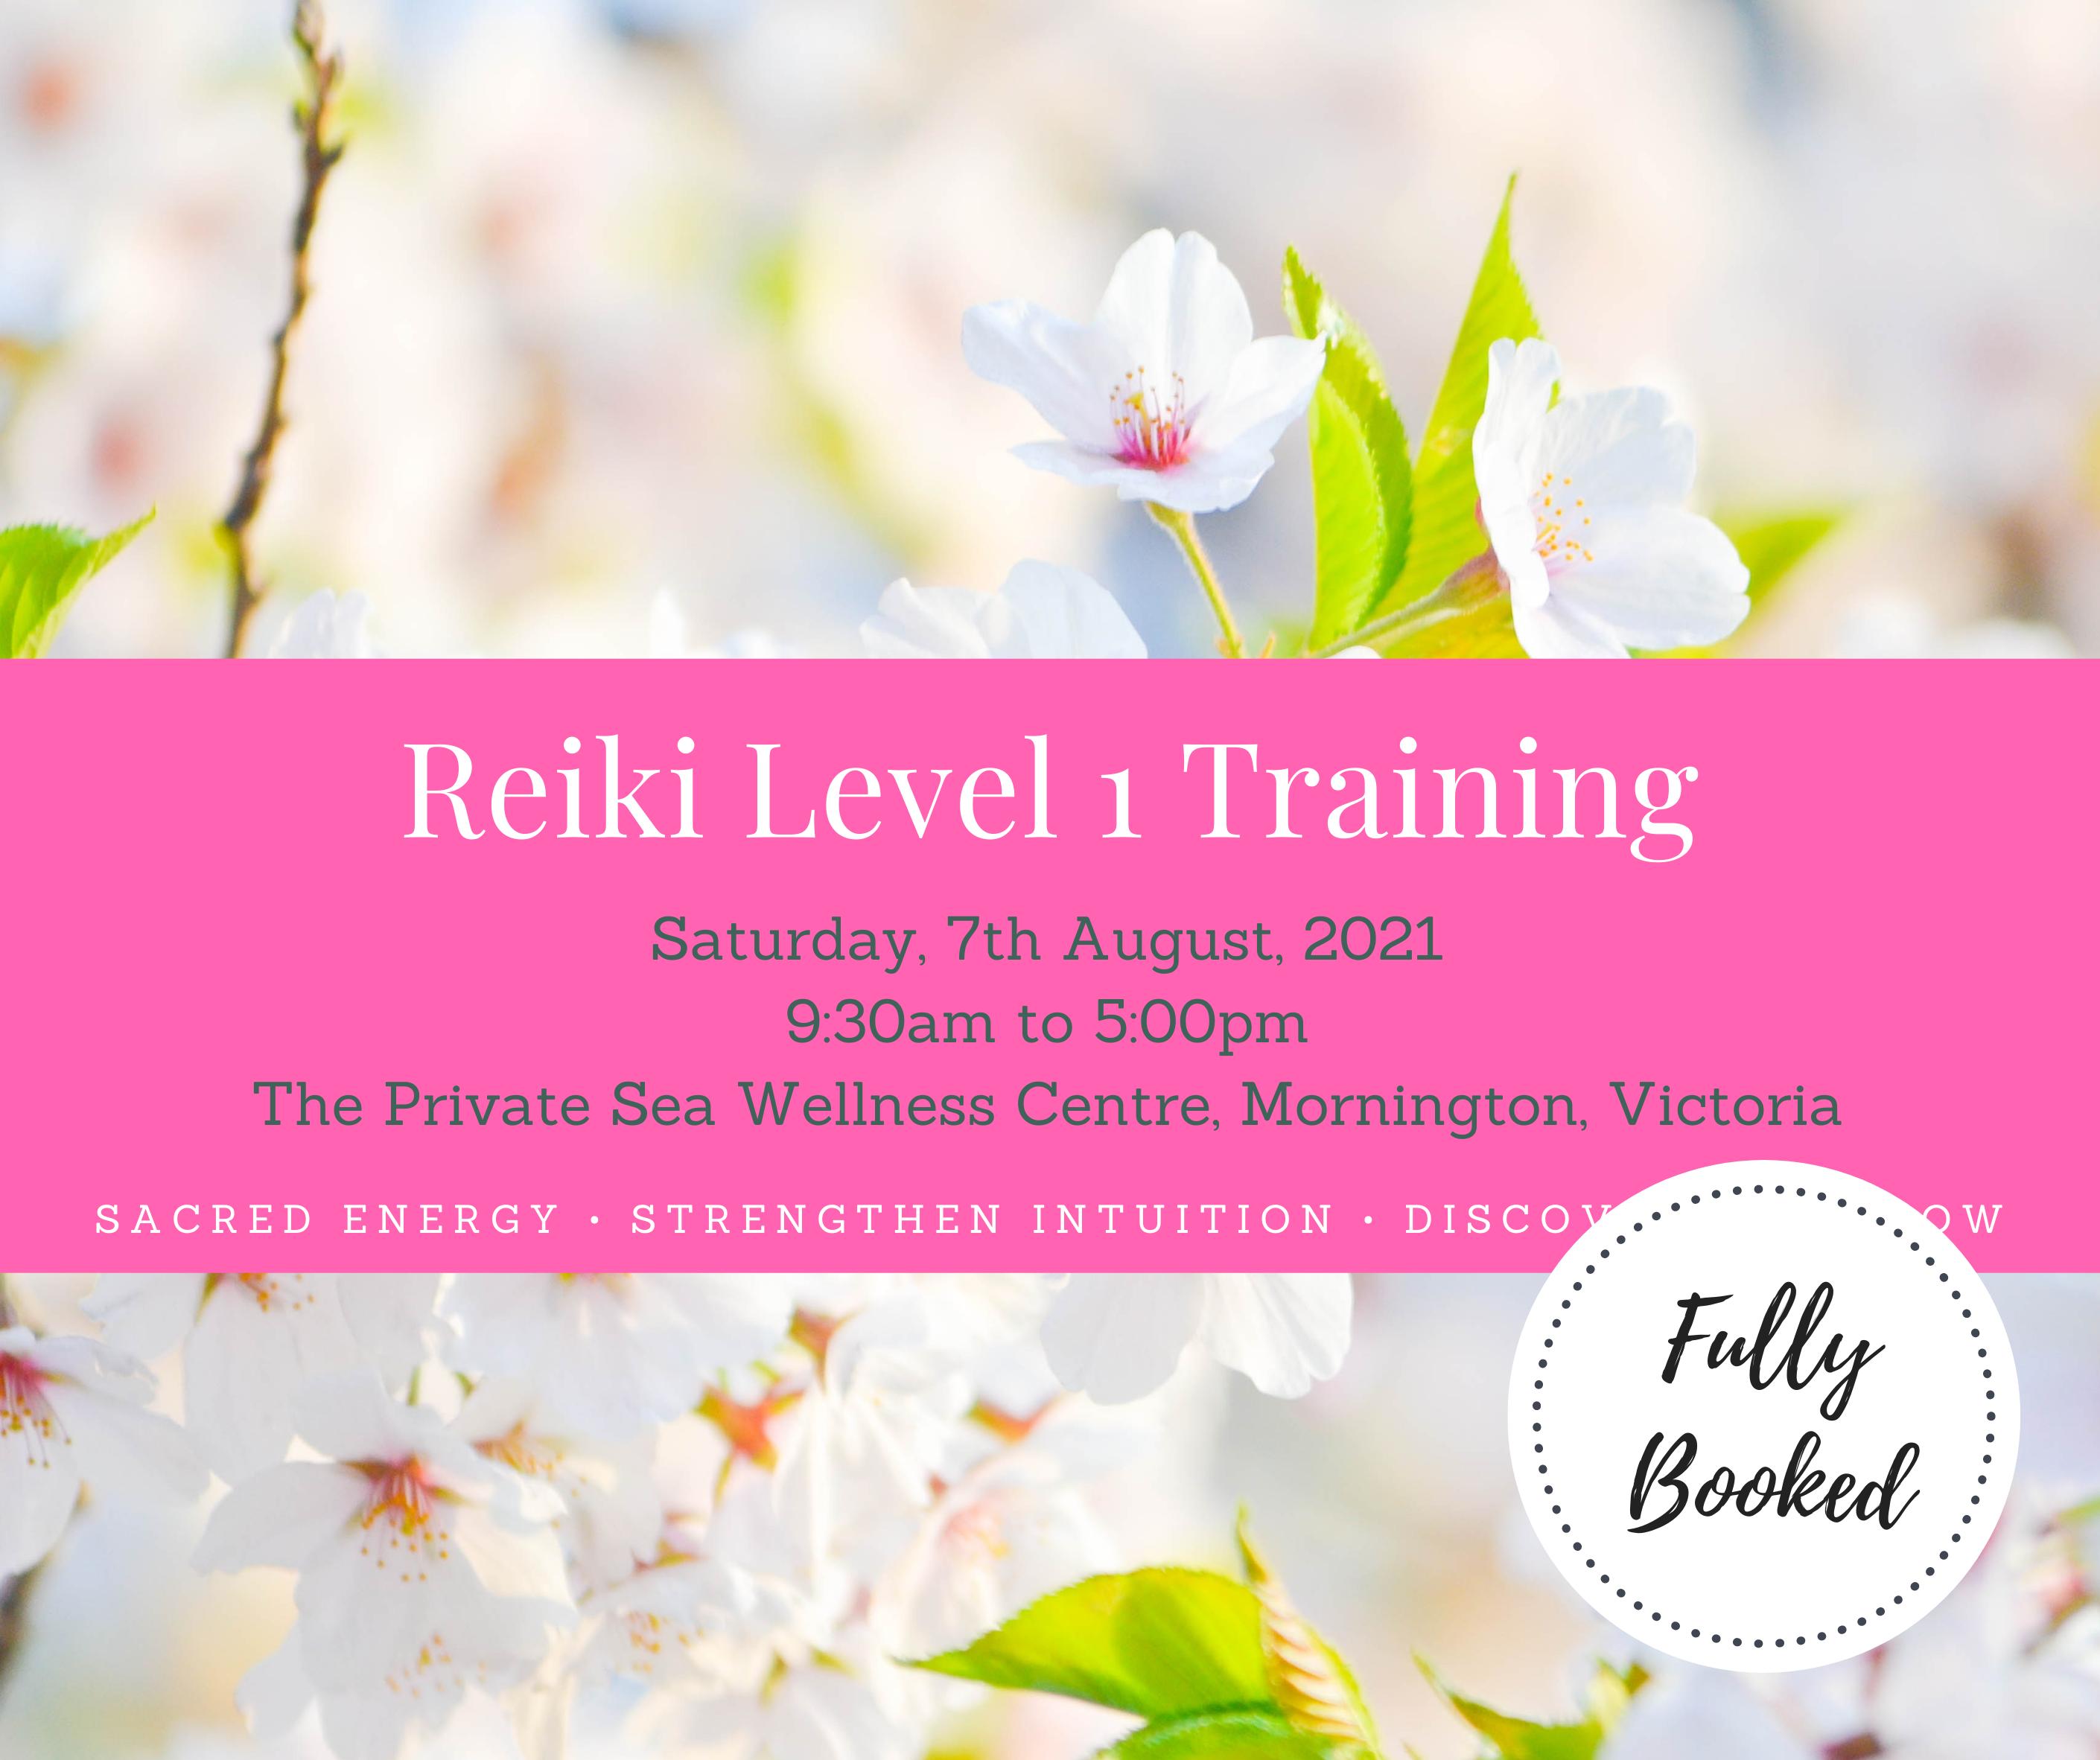 Reiki Level 1 Group Training